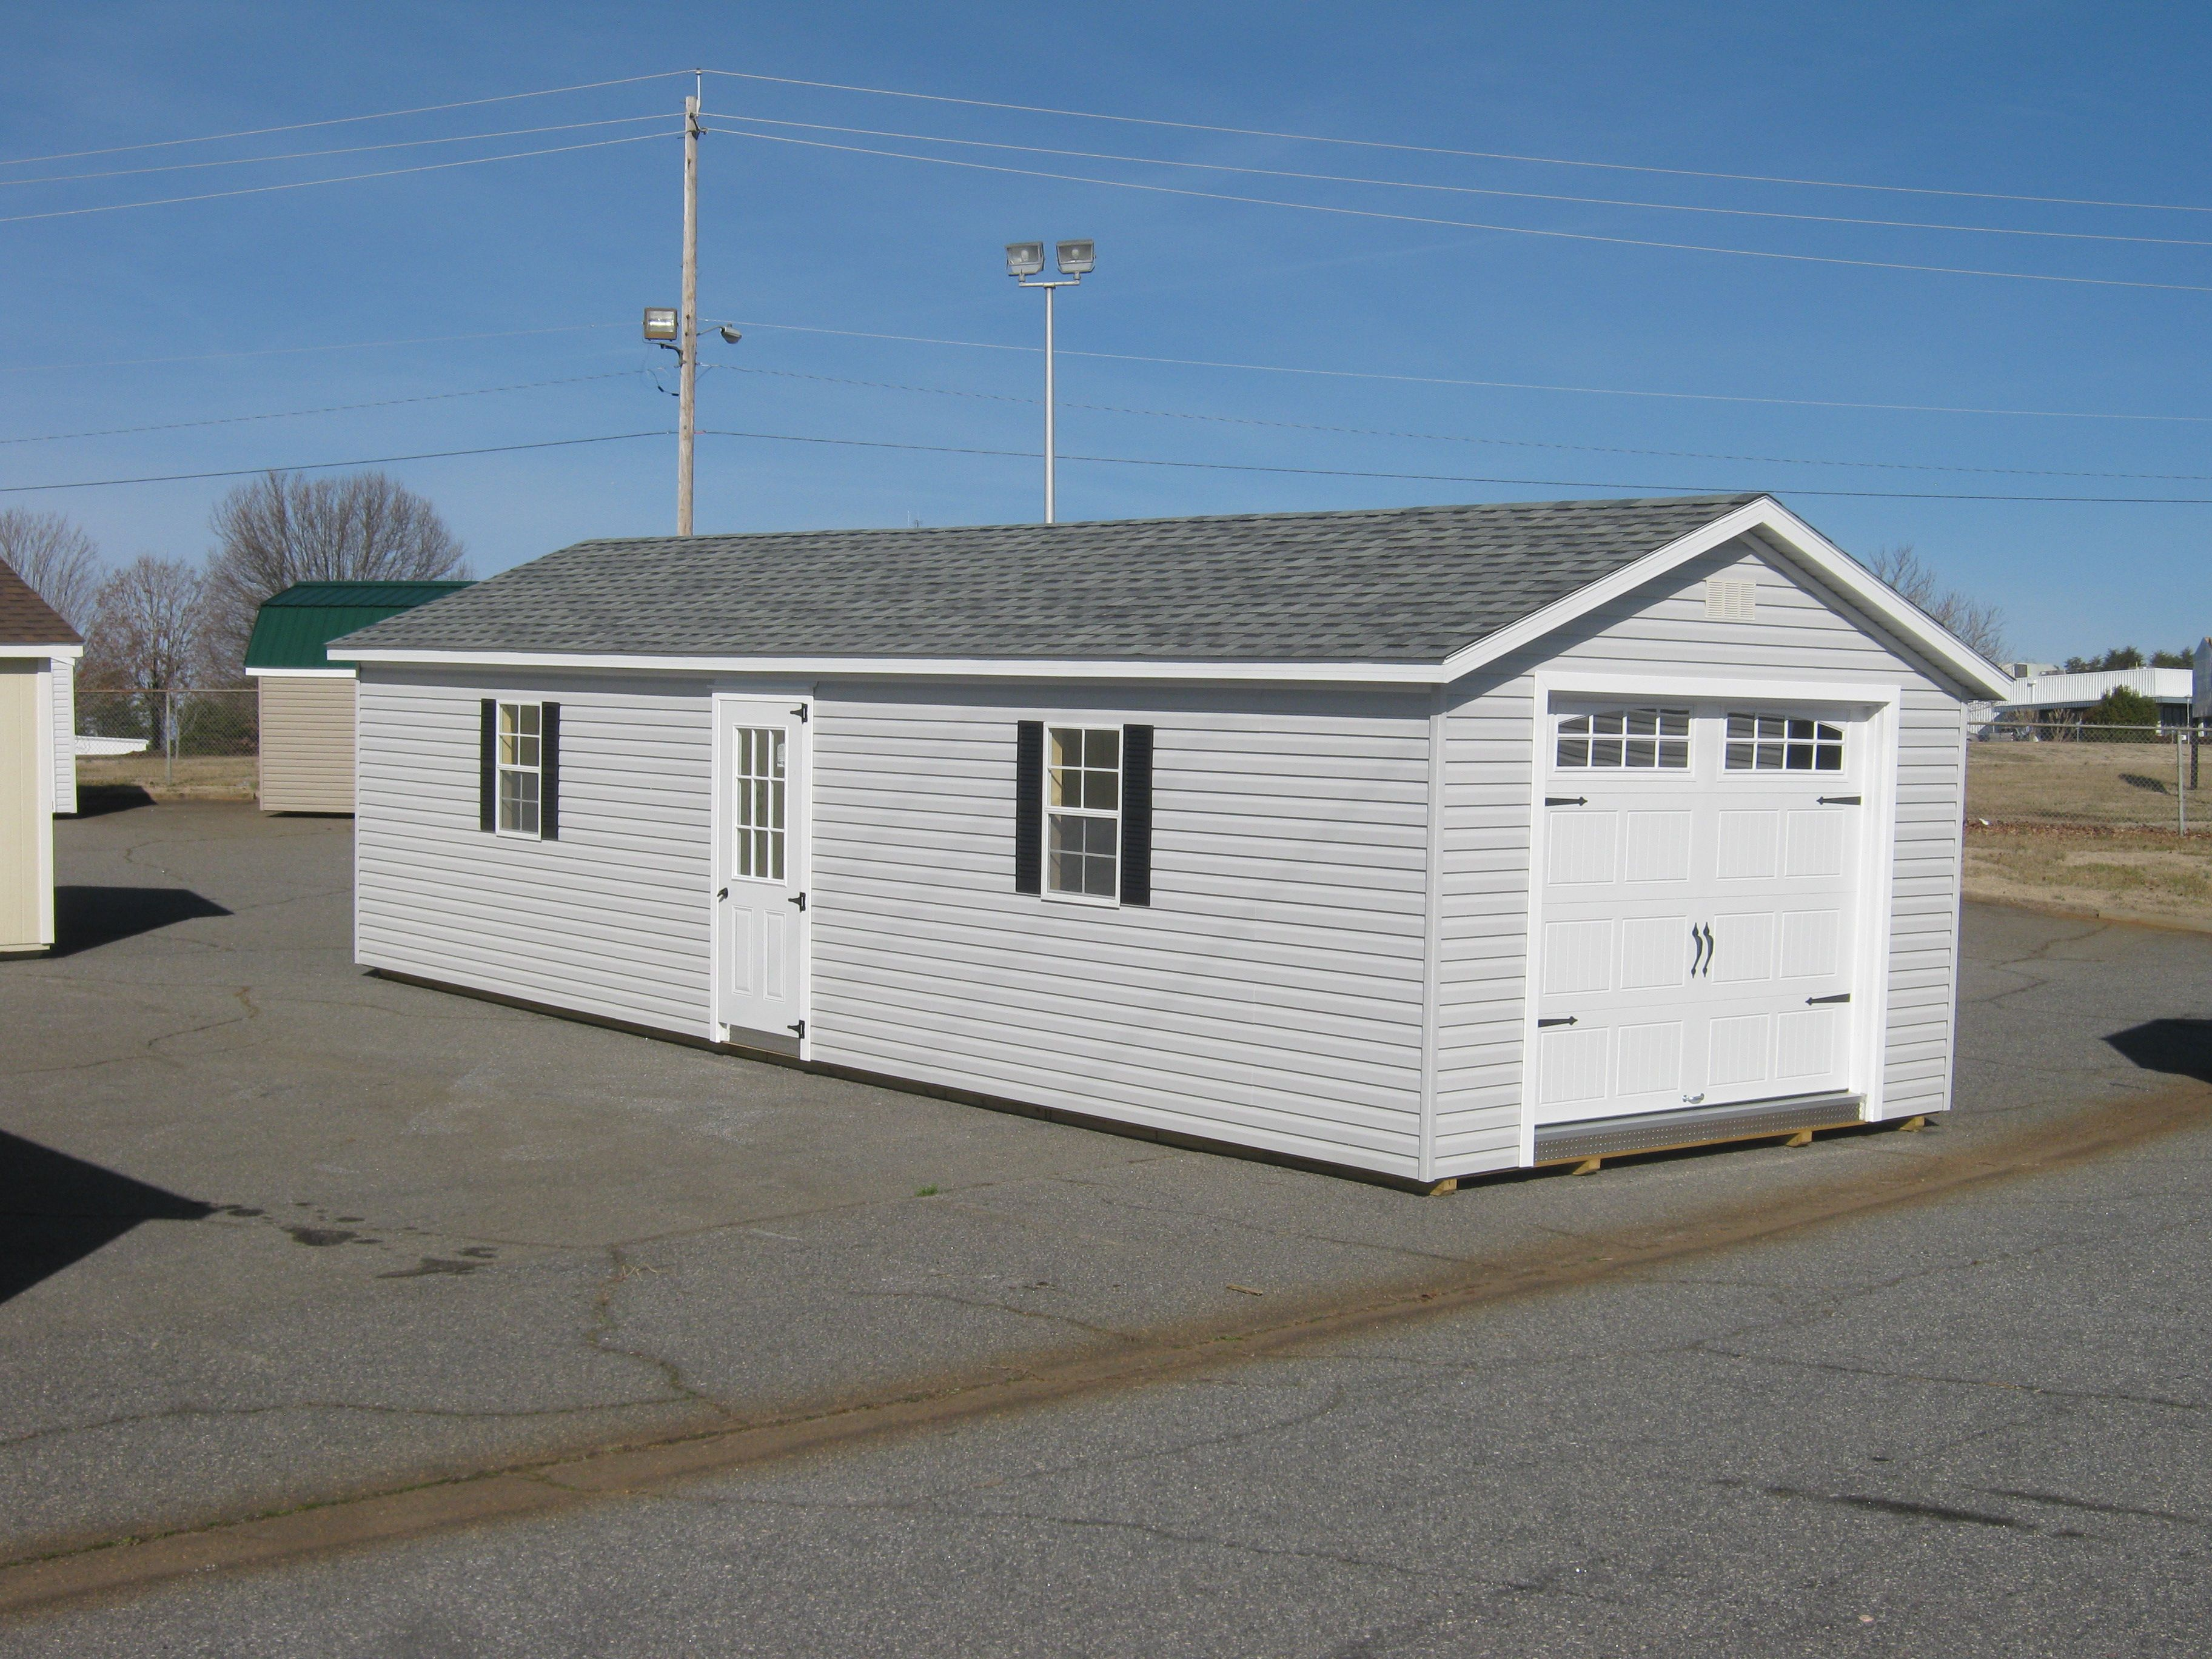 14x40 Vinyl Garage Built In Storage Building Shed